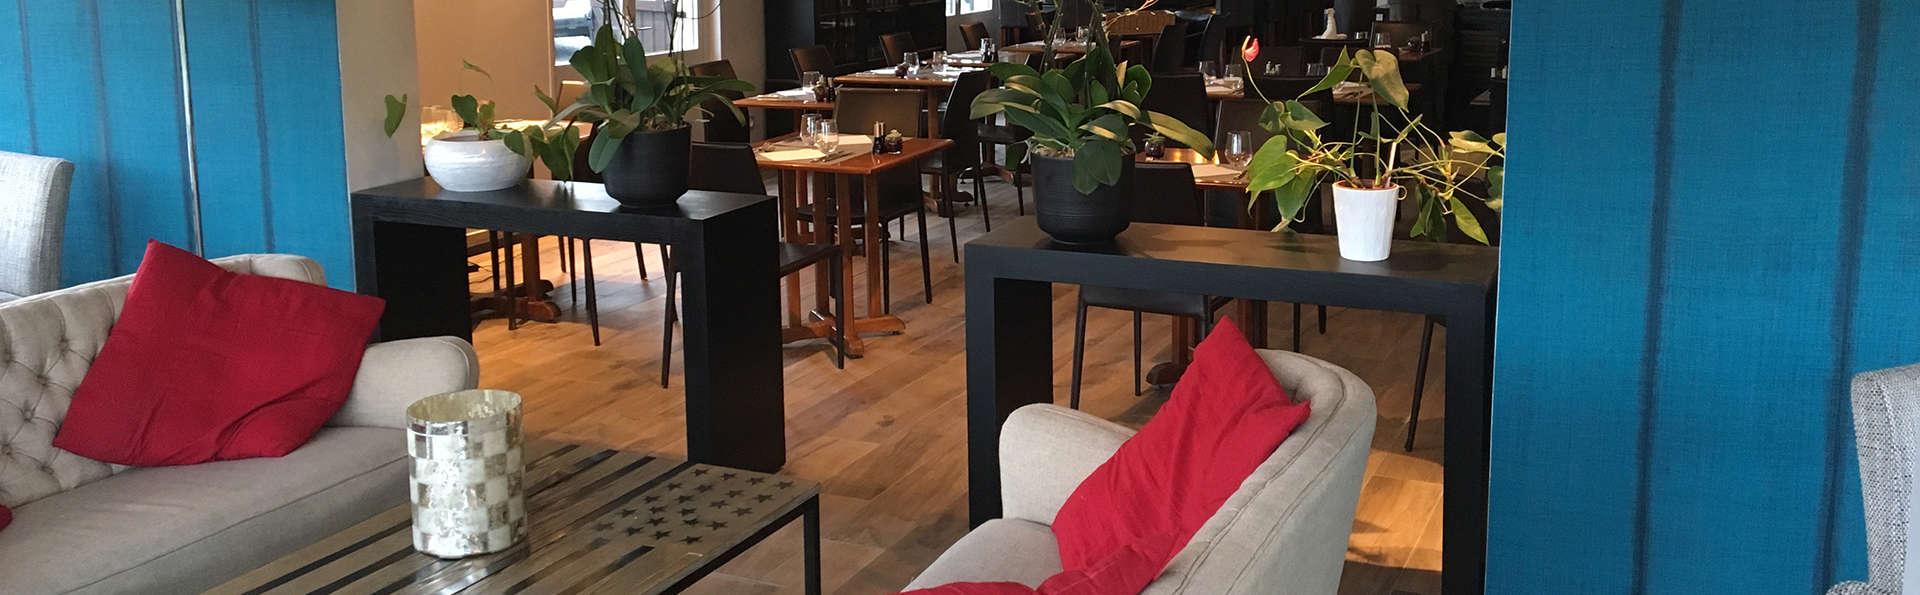 Comfort Hôtel Orly Morangis - Edit_Lobby.jpg